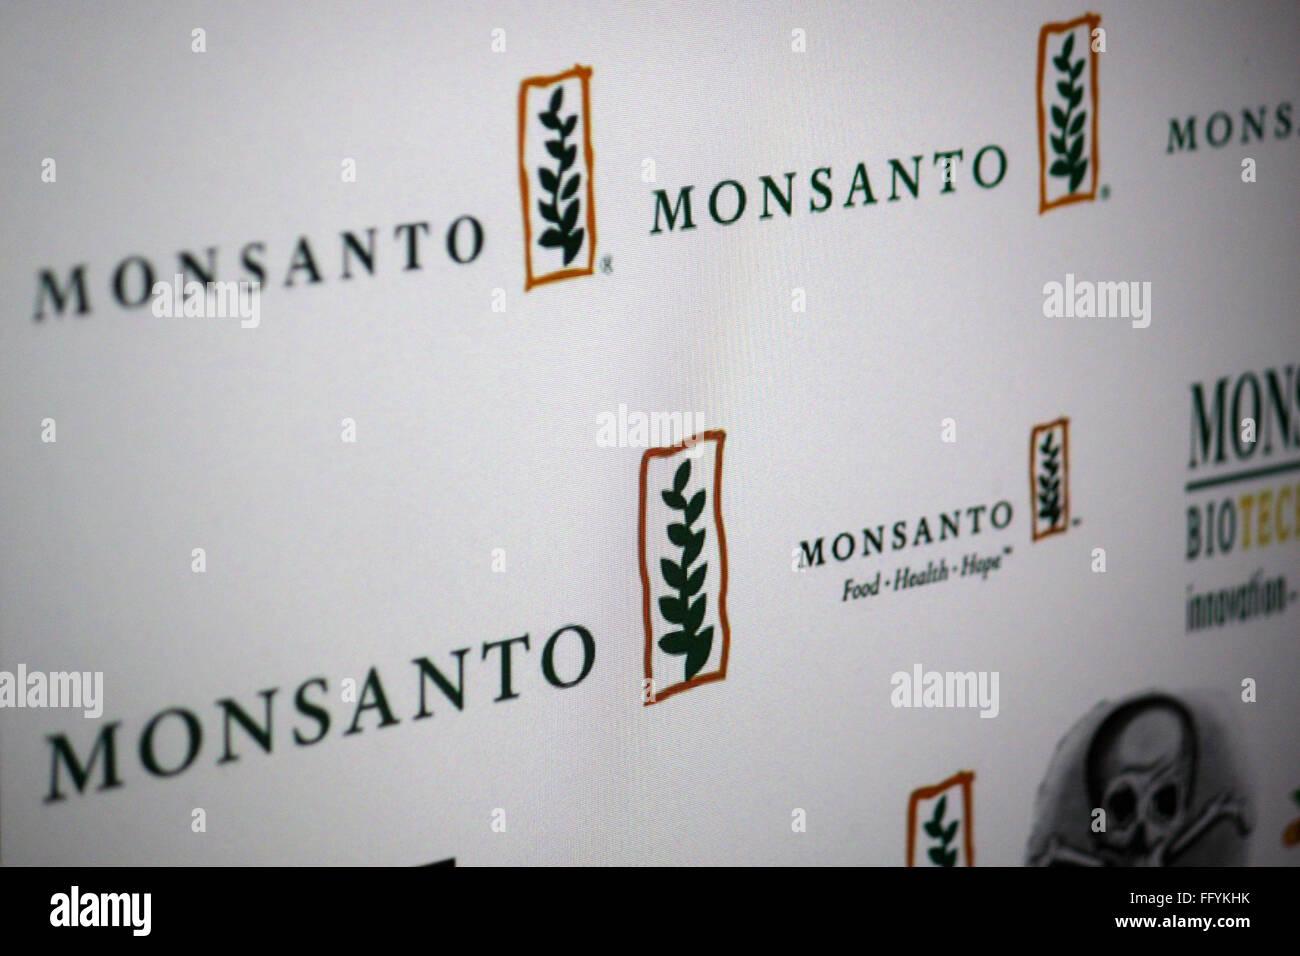 Markenname: 'Monsanto'. - Stock Image